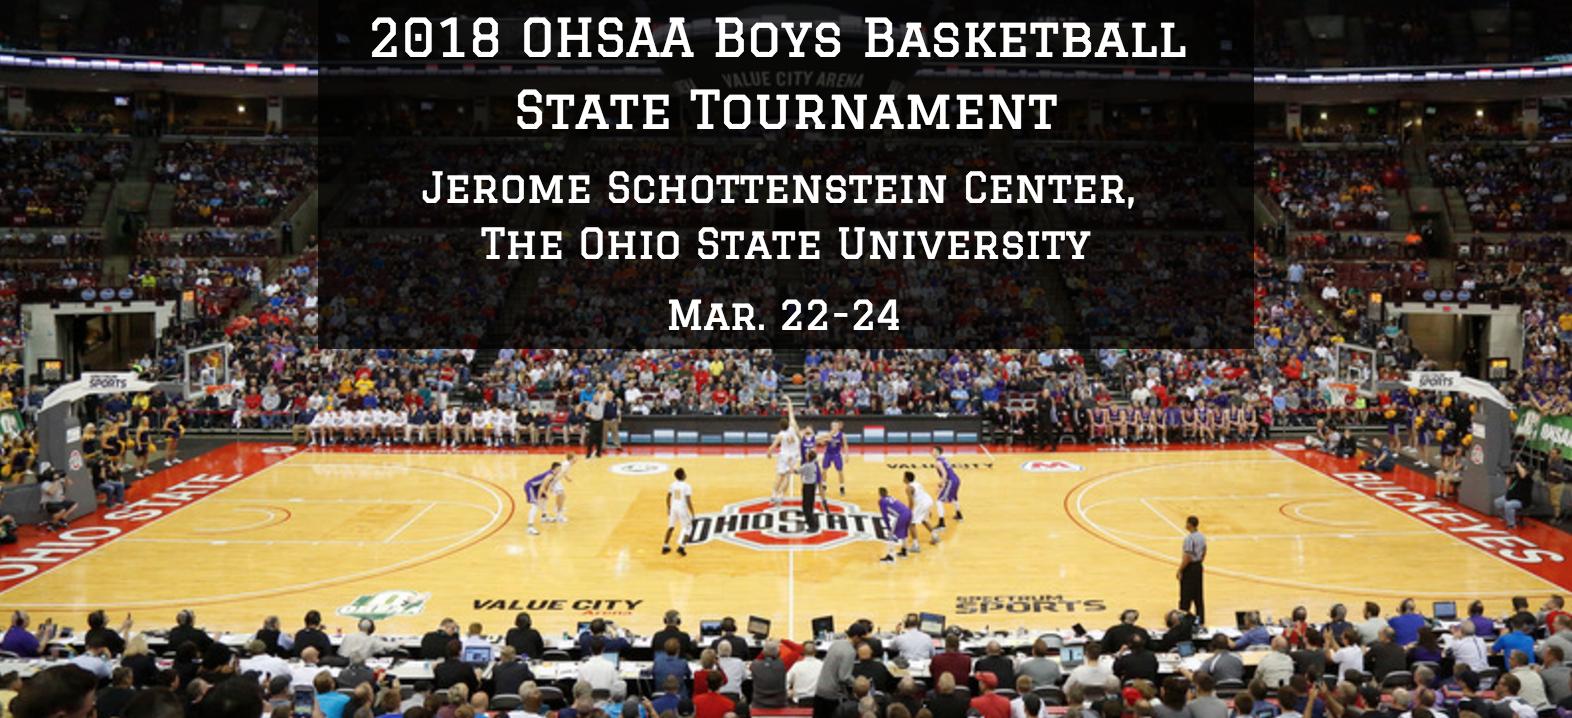 OHSAA Boys Basketball